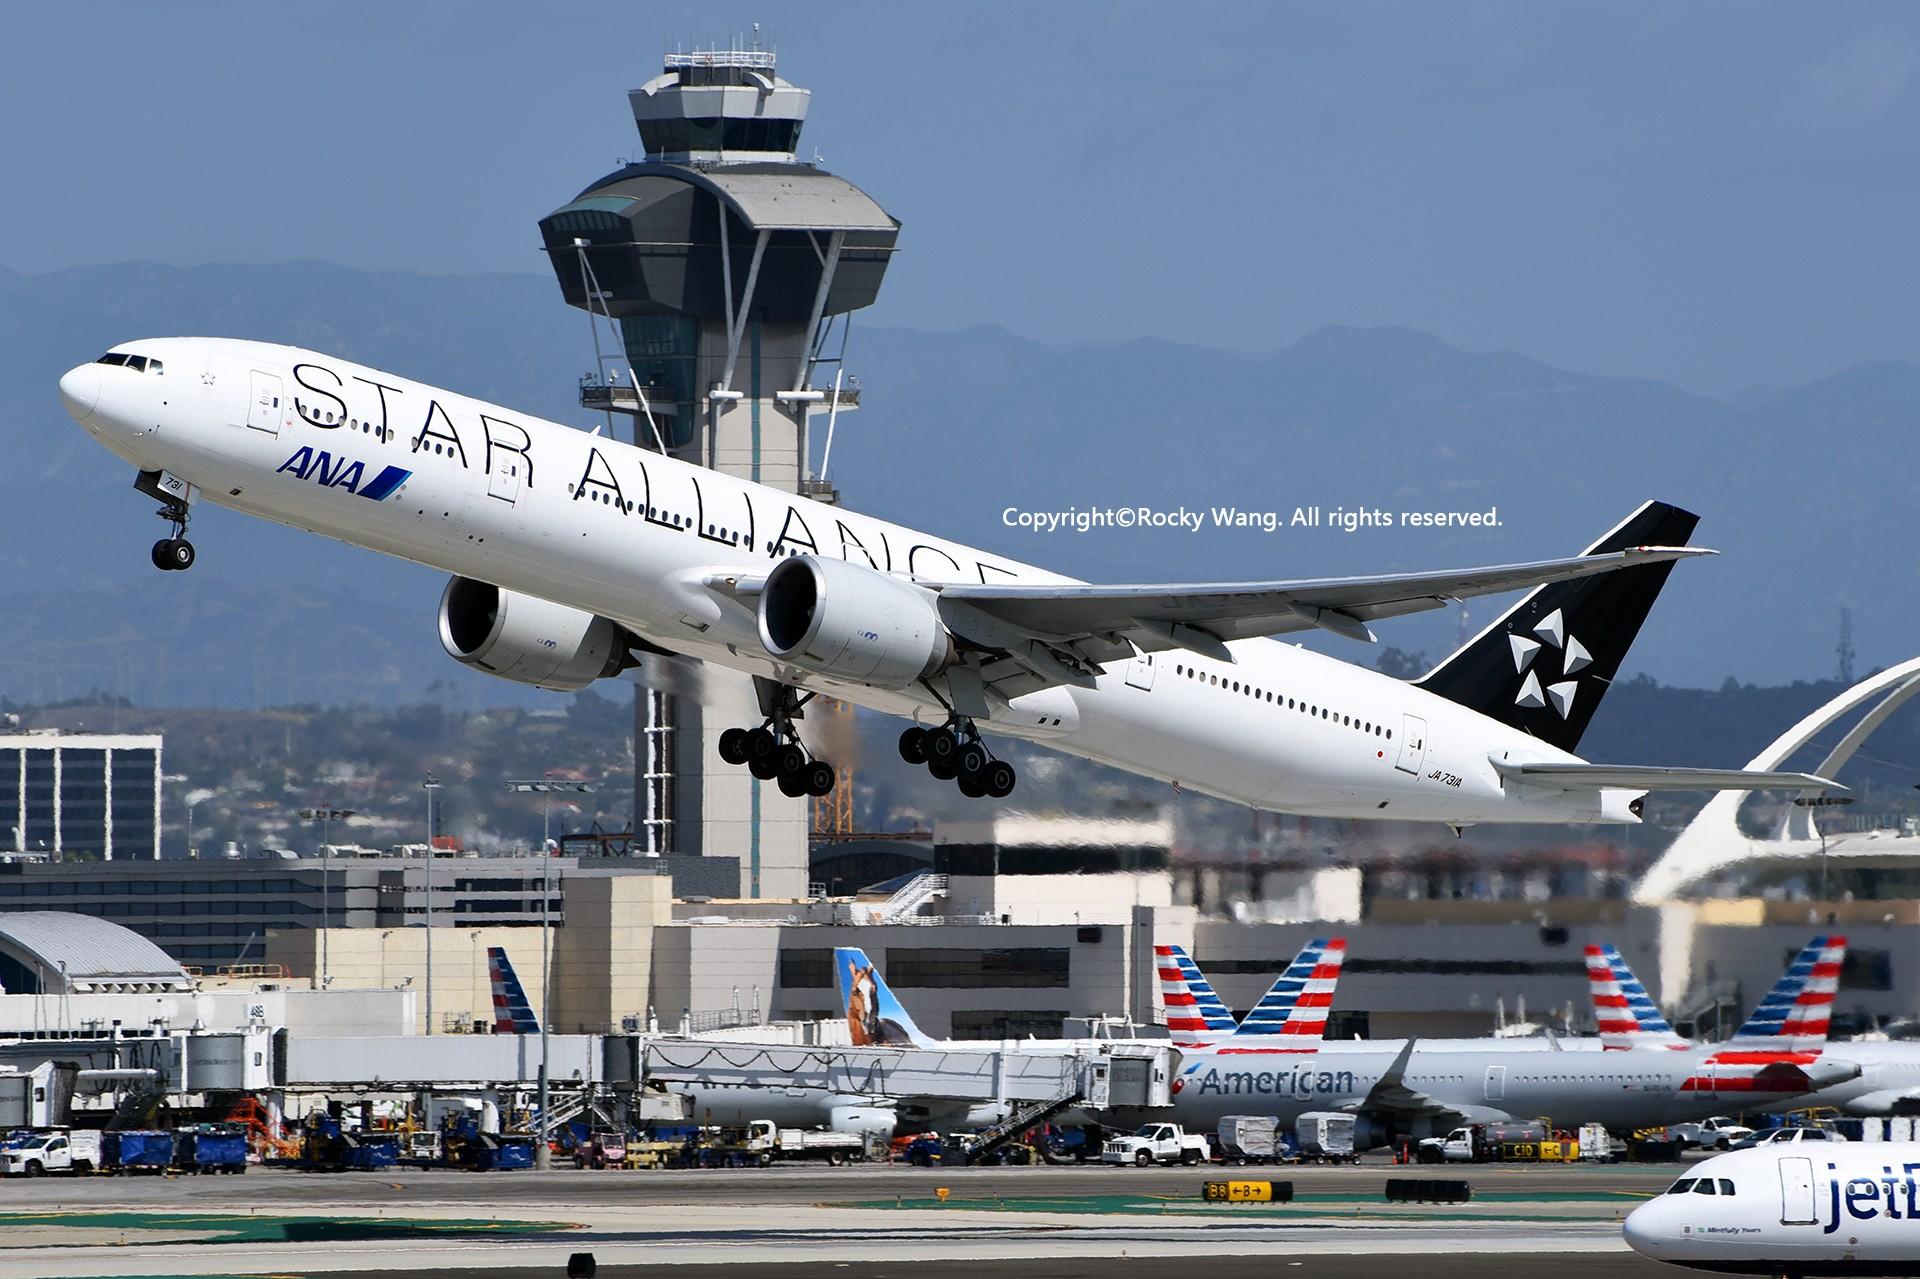 Re:[原创]彩绘圣地-附加彩蛋 BOEING 777-381ER JA731A Los Angeles Int'l Airport